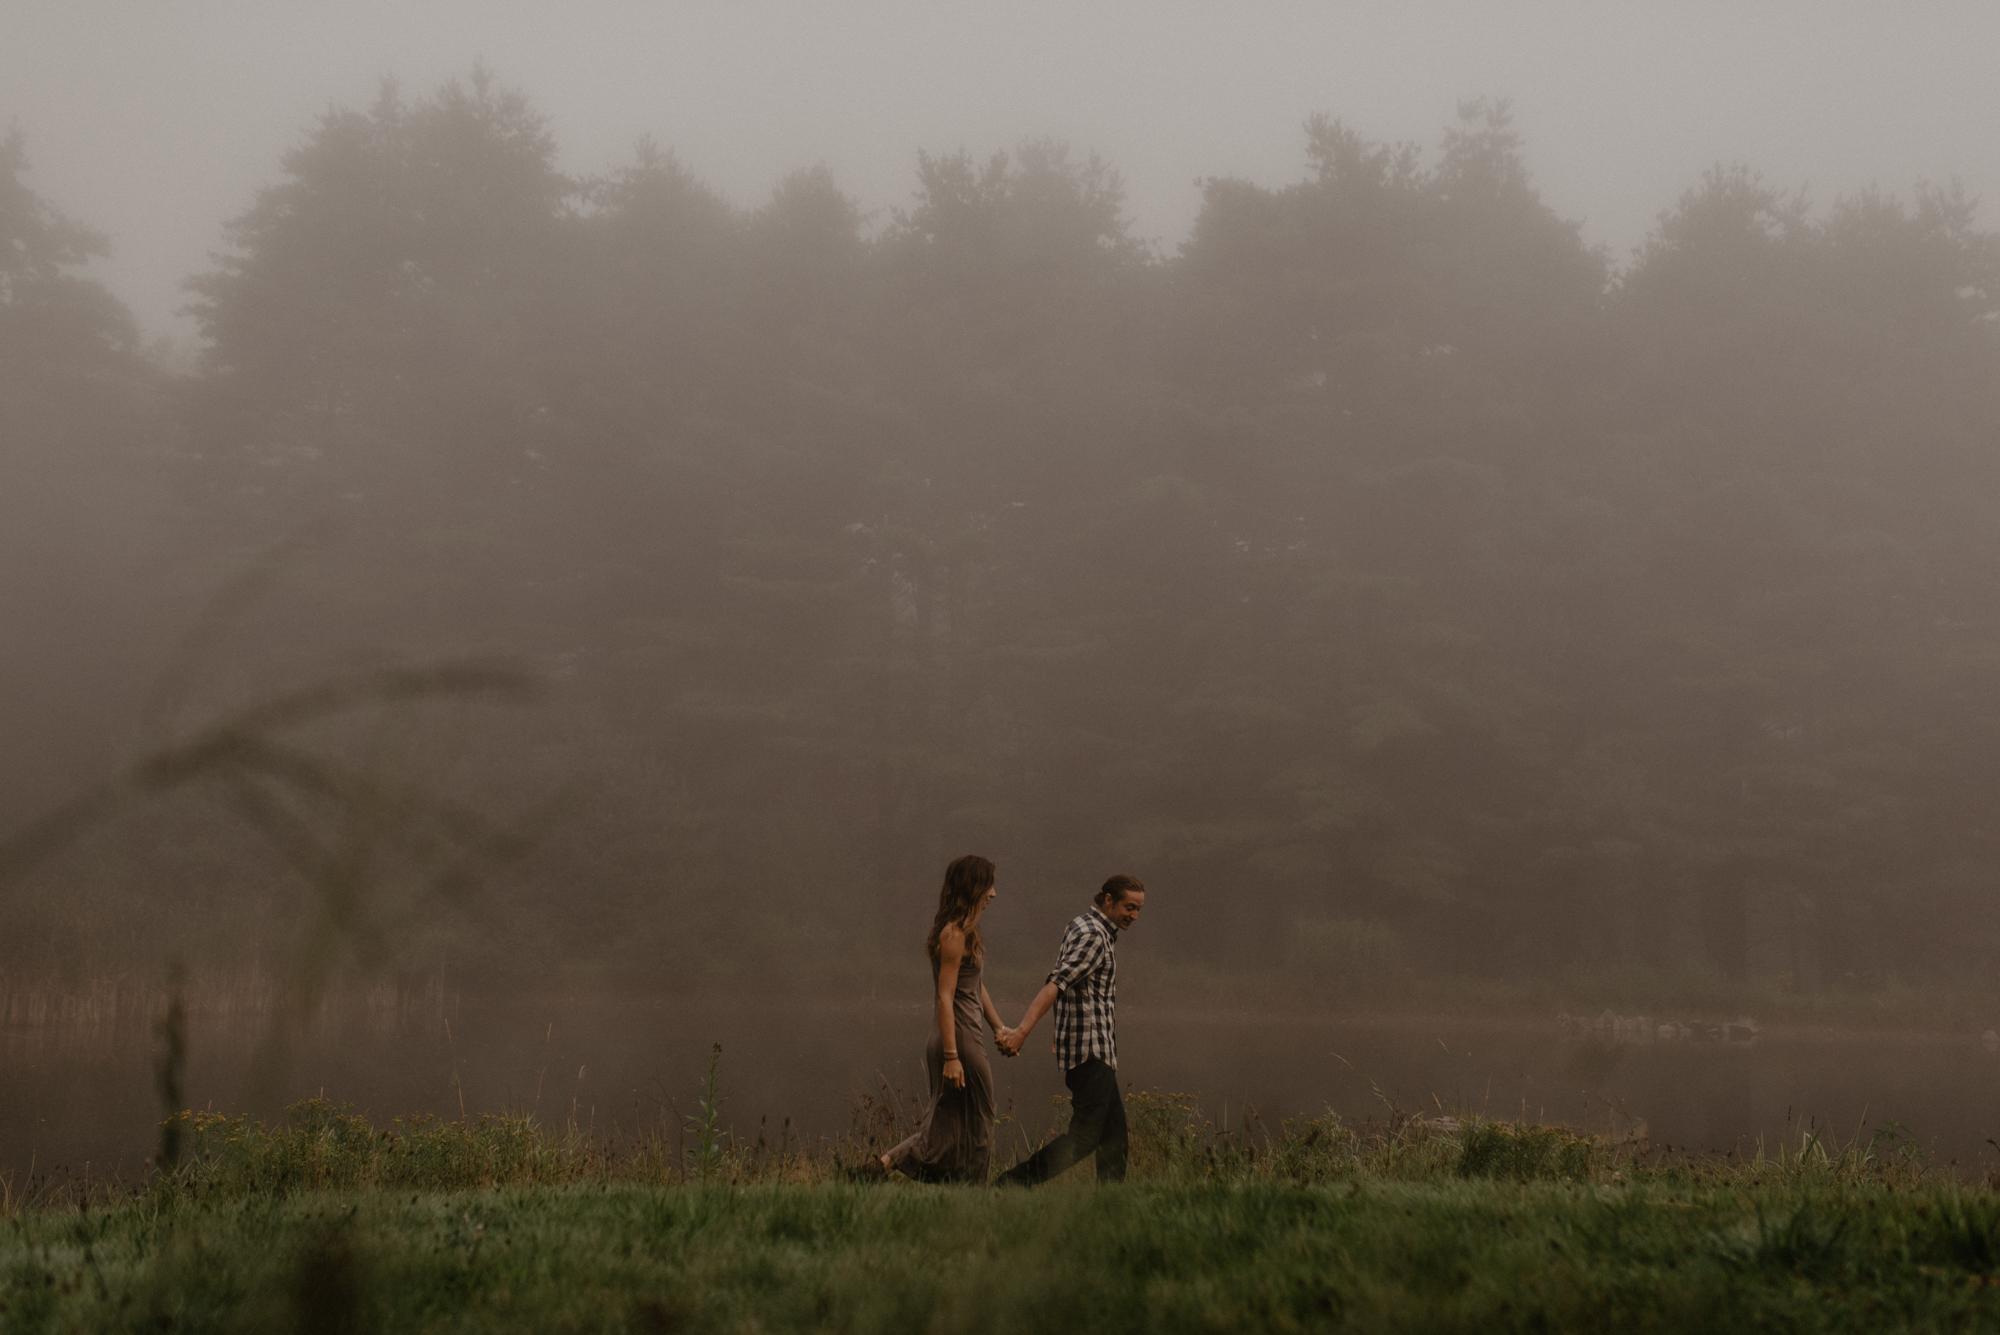 Foggy morning photo